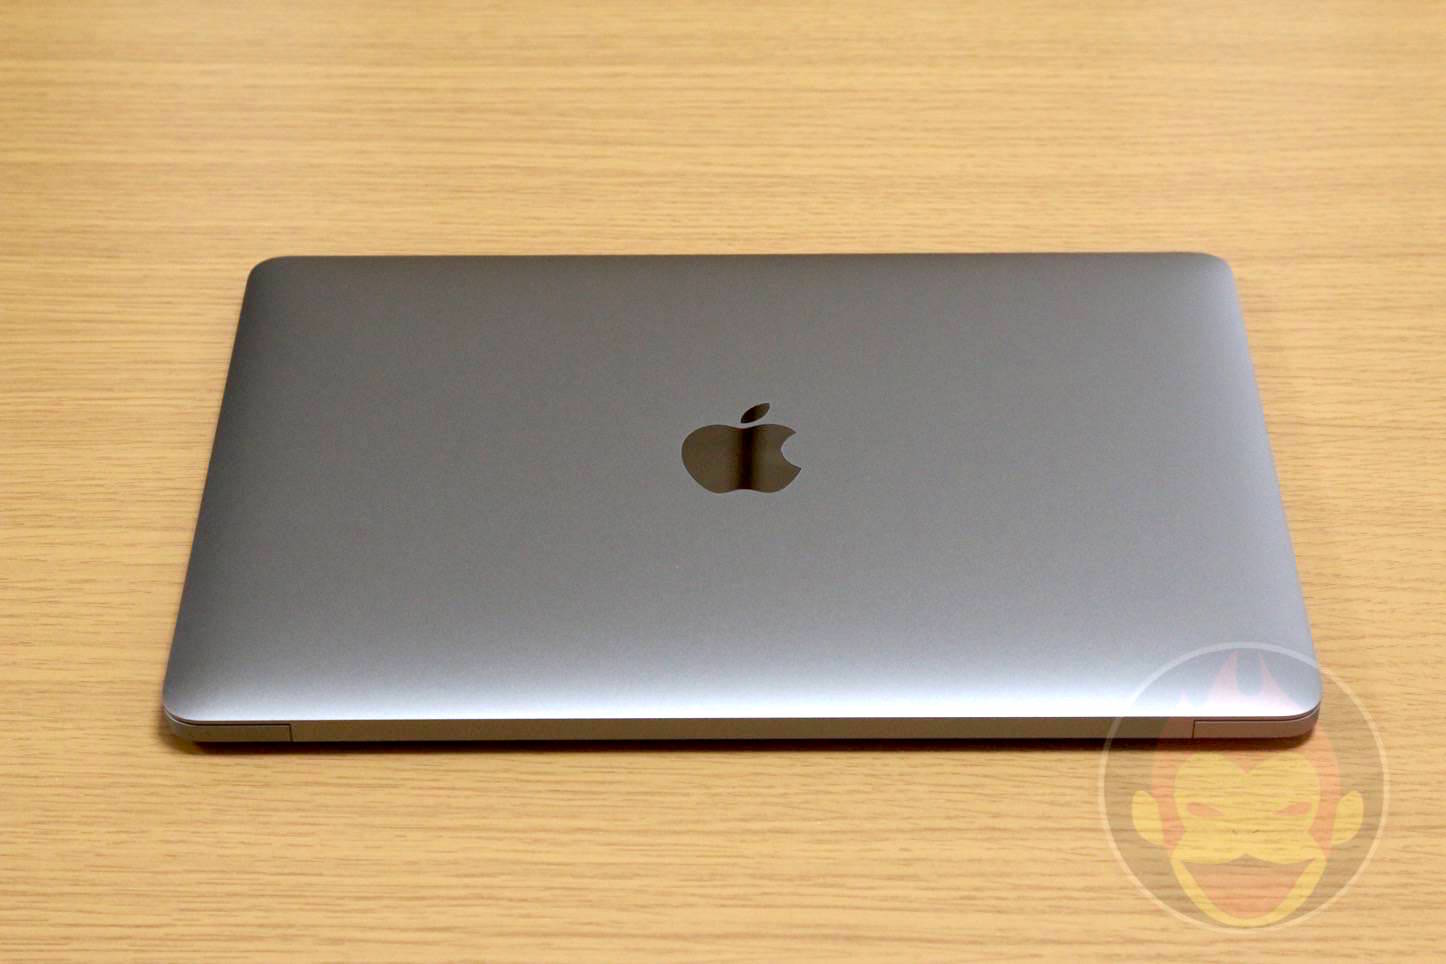 12inch-The-New-MacBook-42.JPG